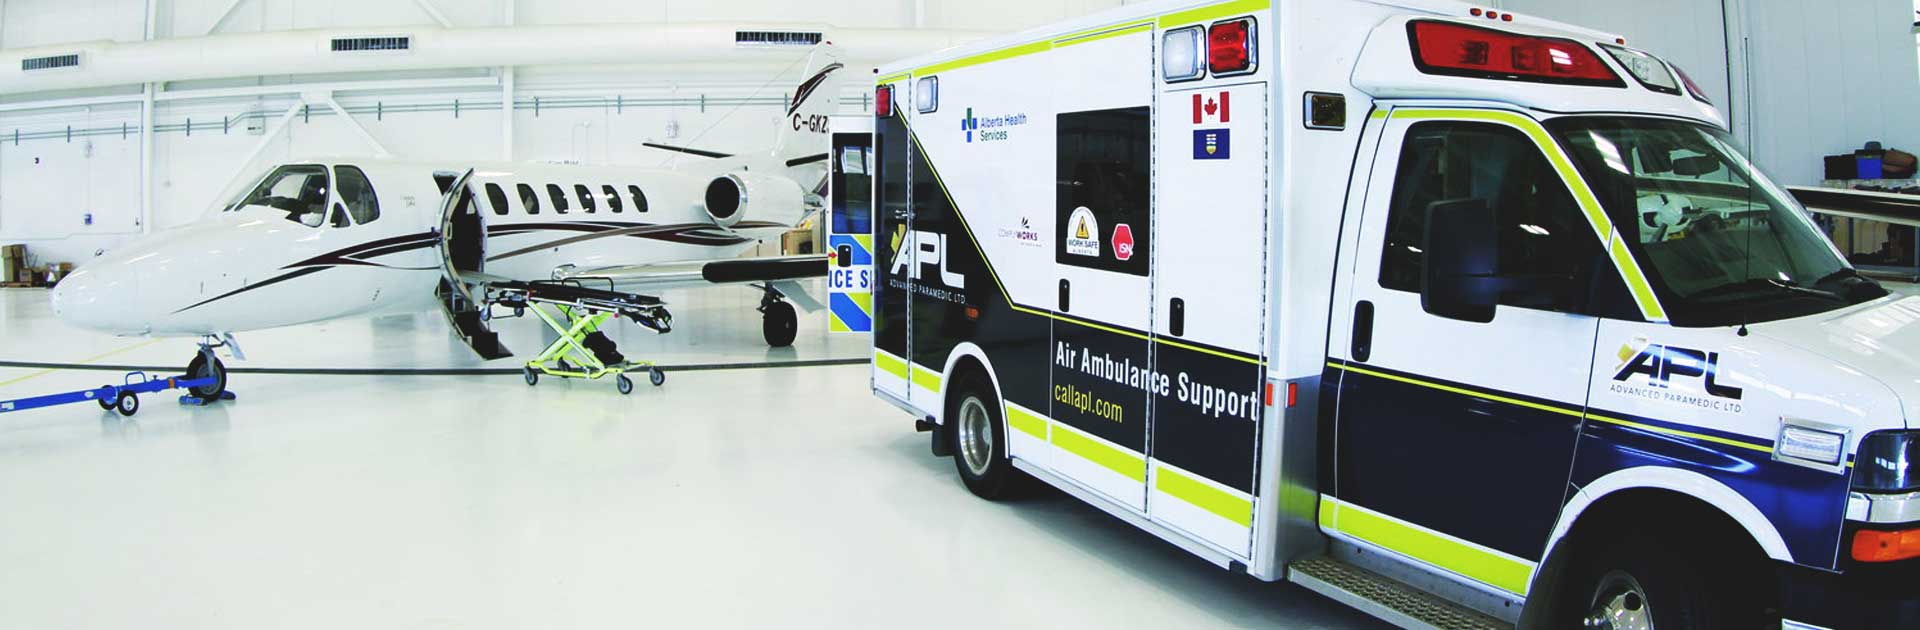 advanced-paramedics-slide-1